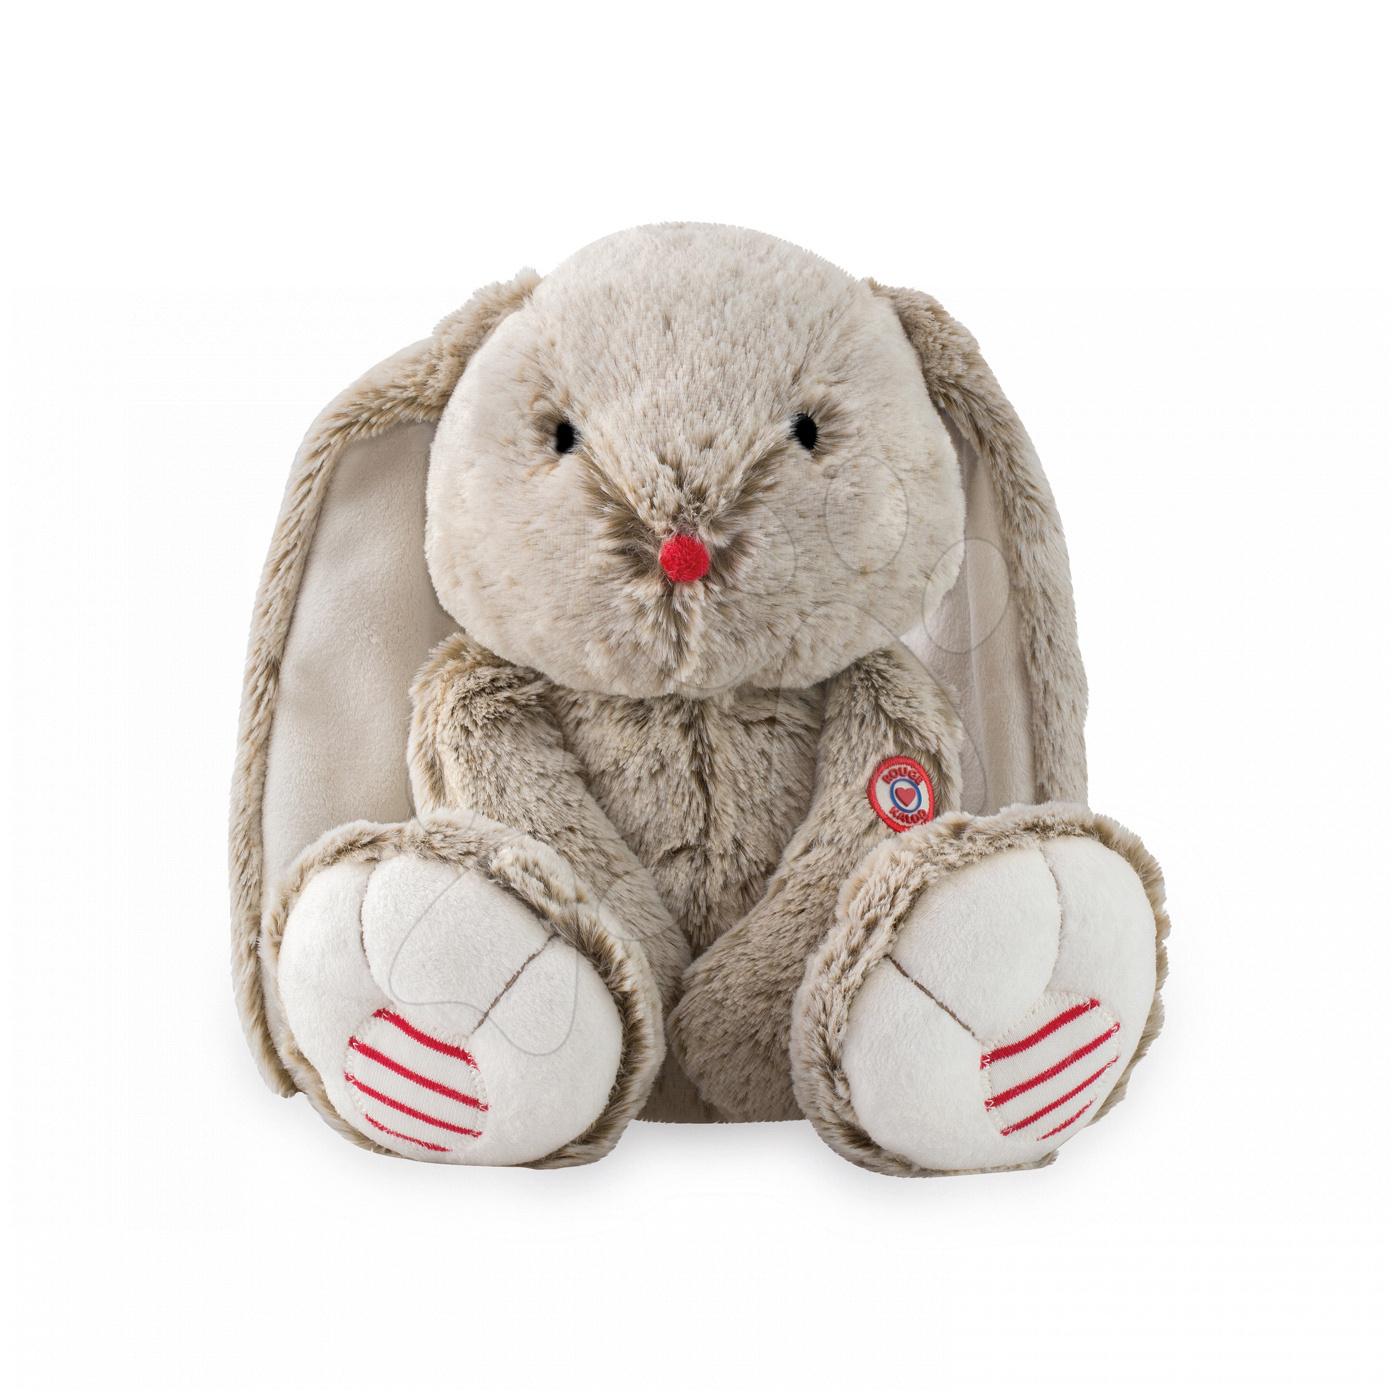 Plyšový zajačik Rouge Kaloo 38 cm pre najmenších béžový